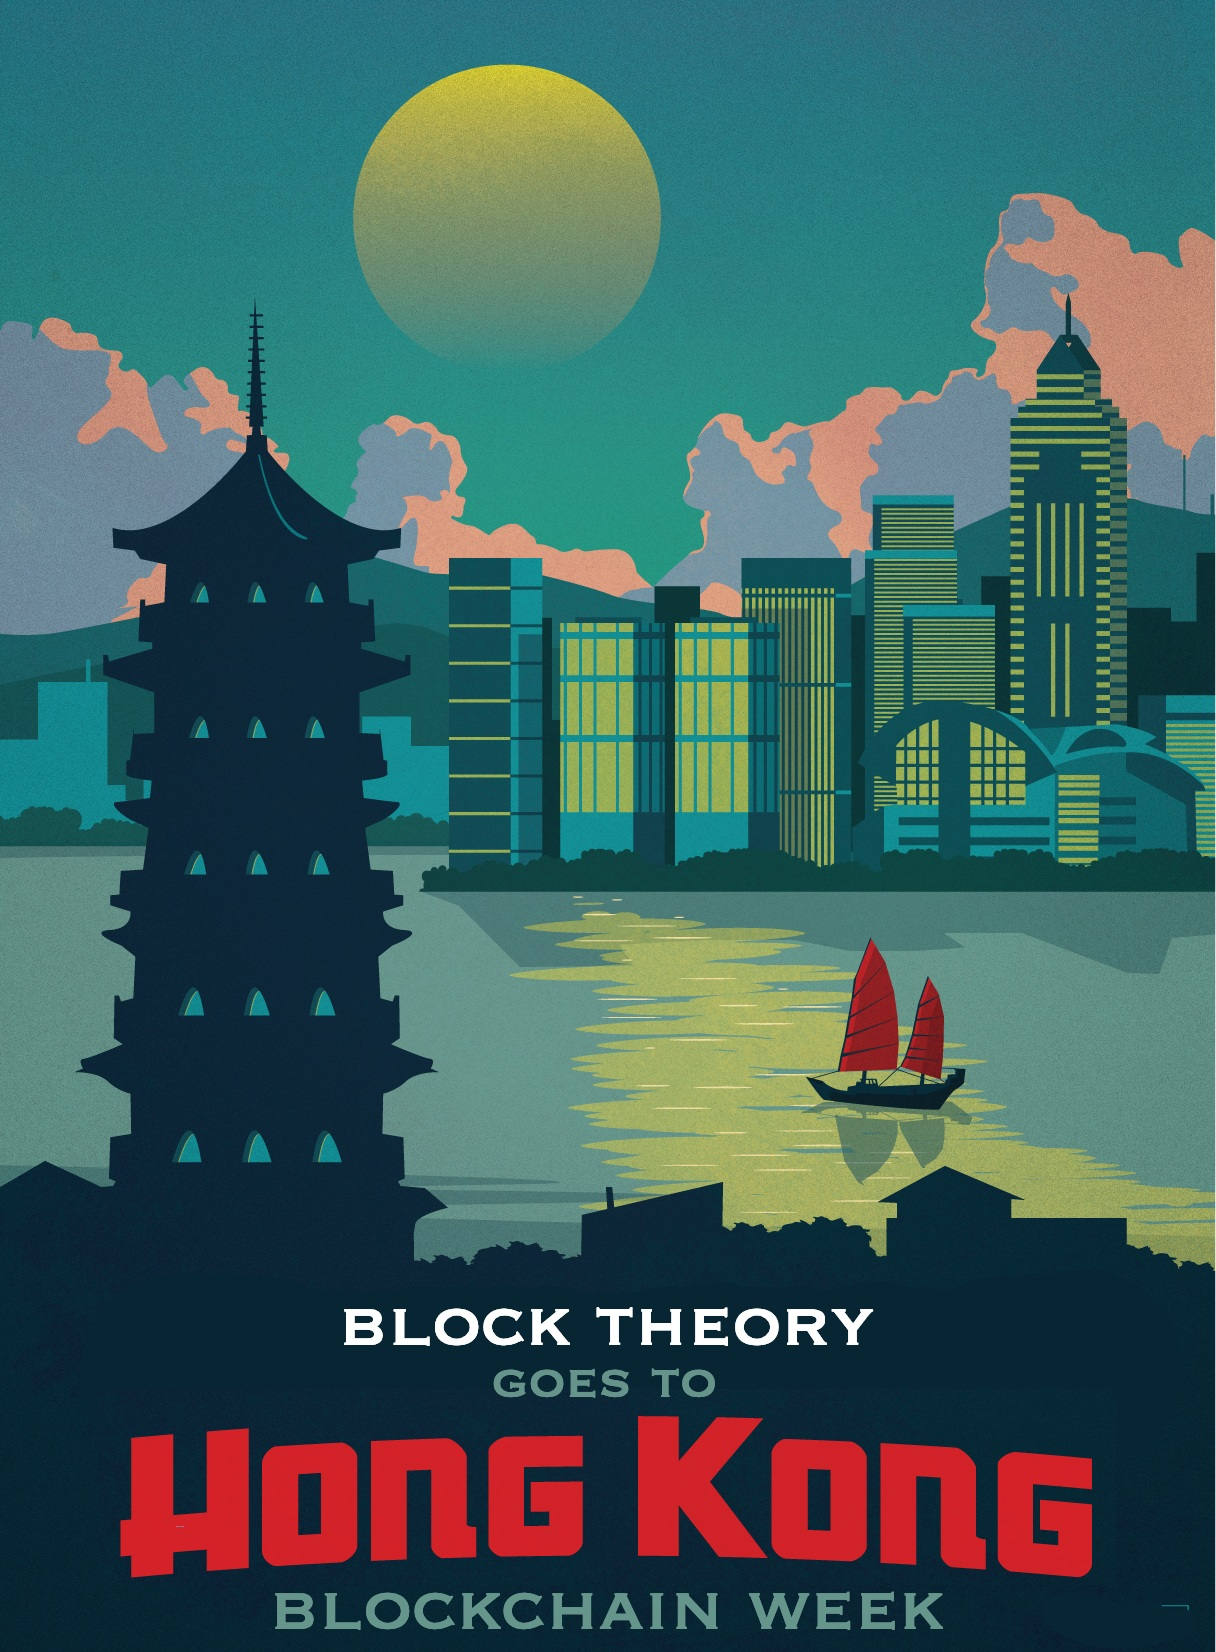 hong-kong-Blackchain-week.jpg